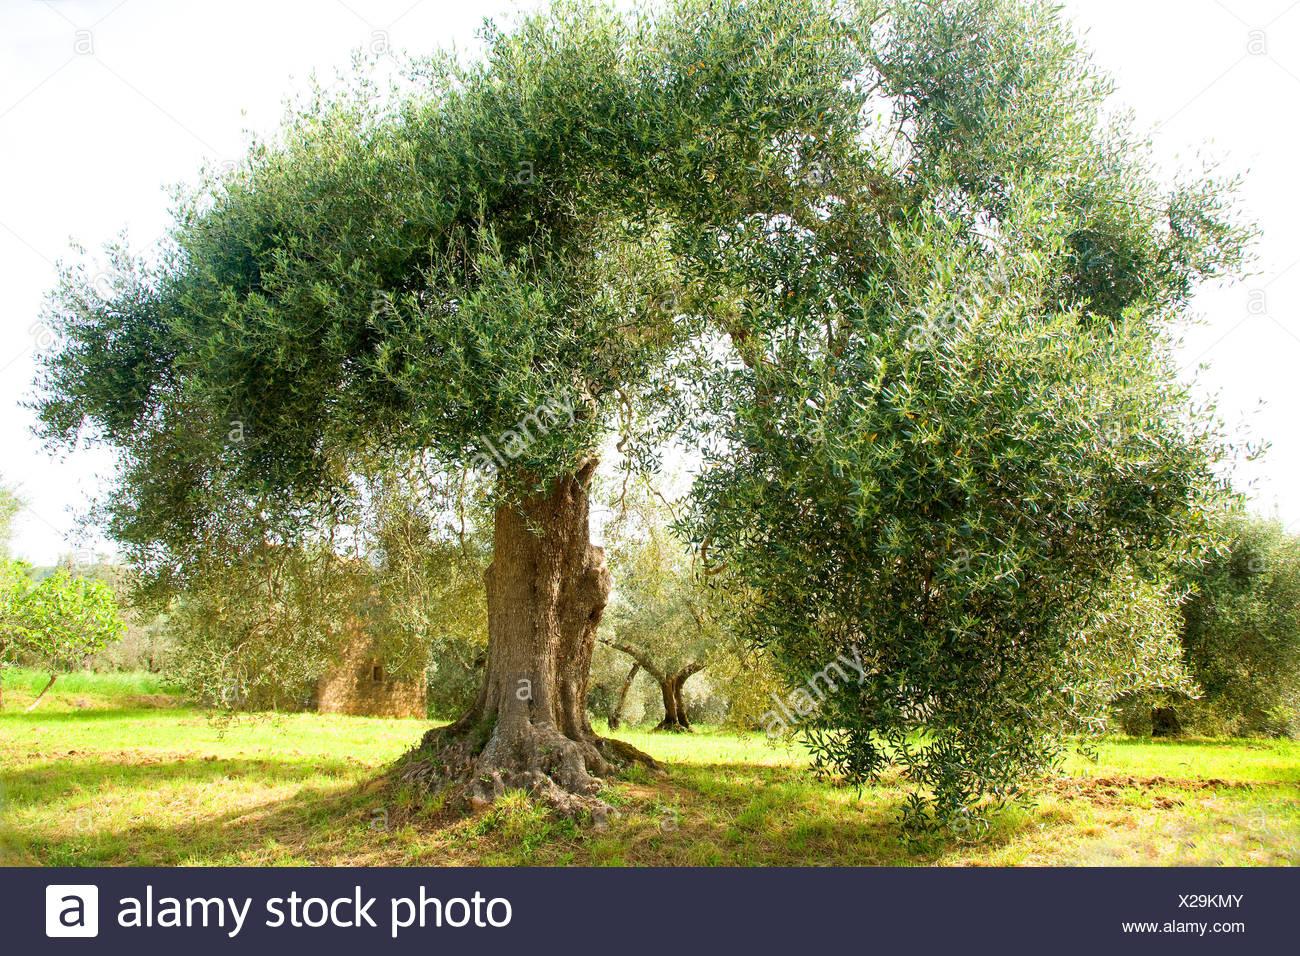 Kultur-Oelbaum, Kultur-Olivenbaum, Oelbaum, Olivenbaum (Olea europaea ssp. sativa), alter Olivenbaum in der Toskana , Italien, T Stock Photo